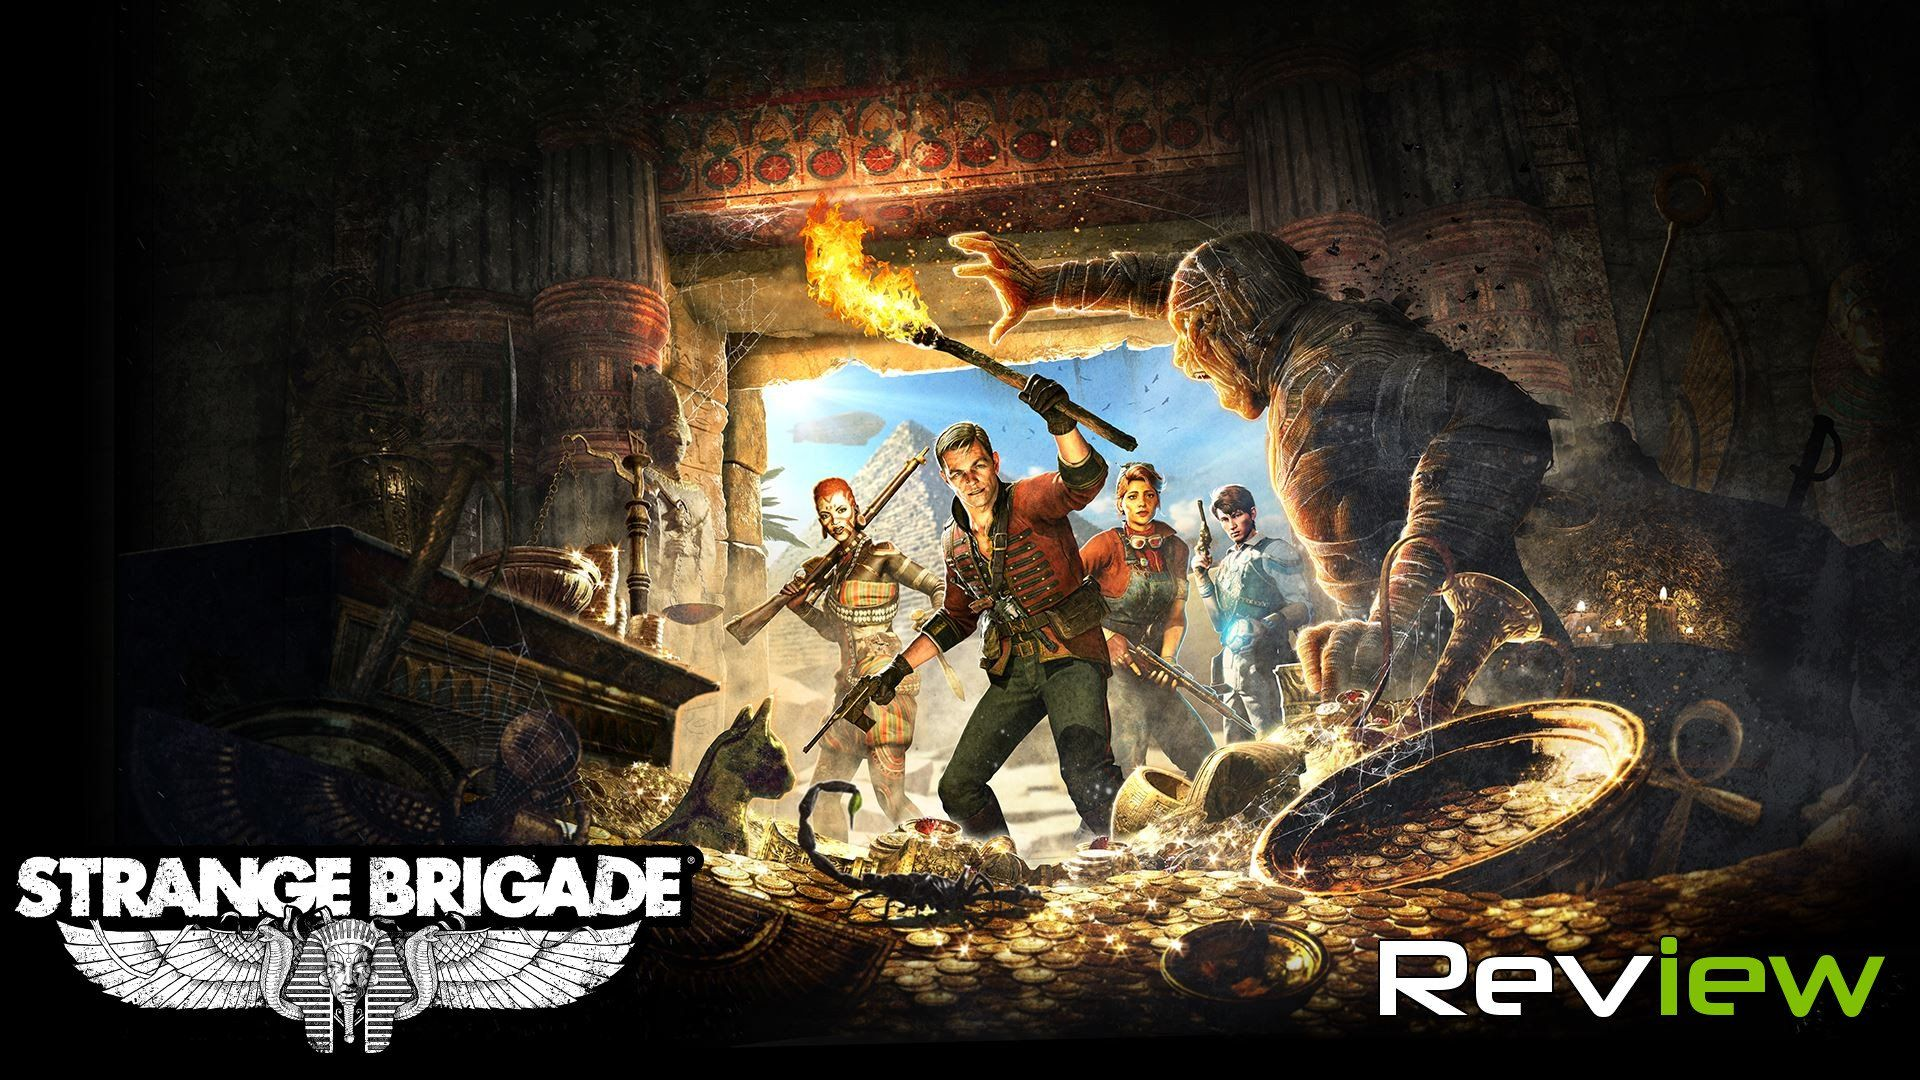 Strange Brigade Review The Spirit Of Adventure Zombie Army Scenes Strange